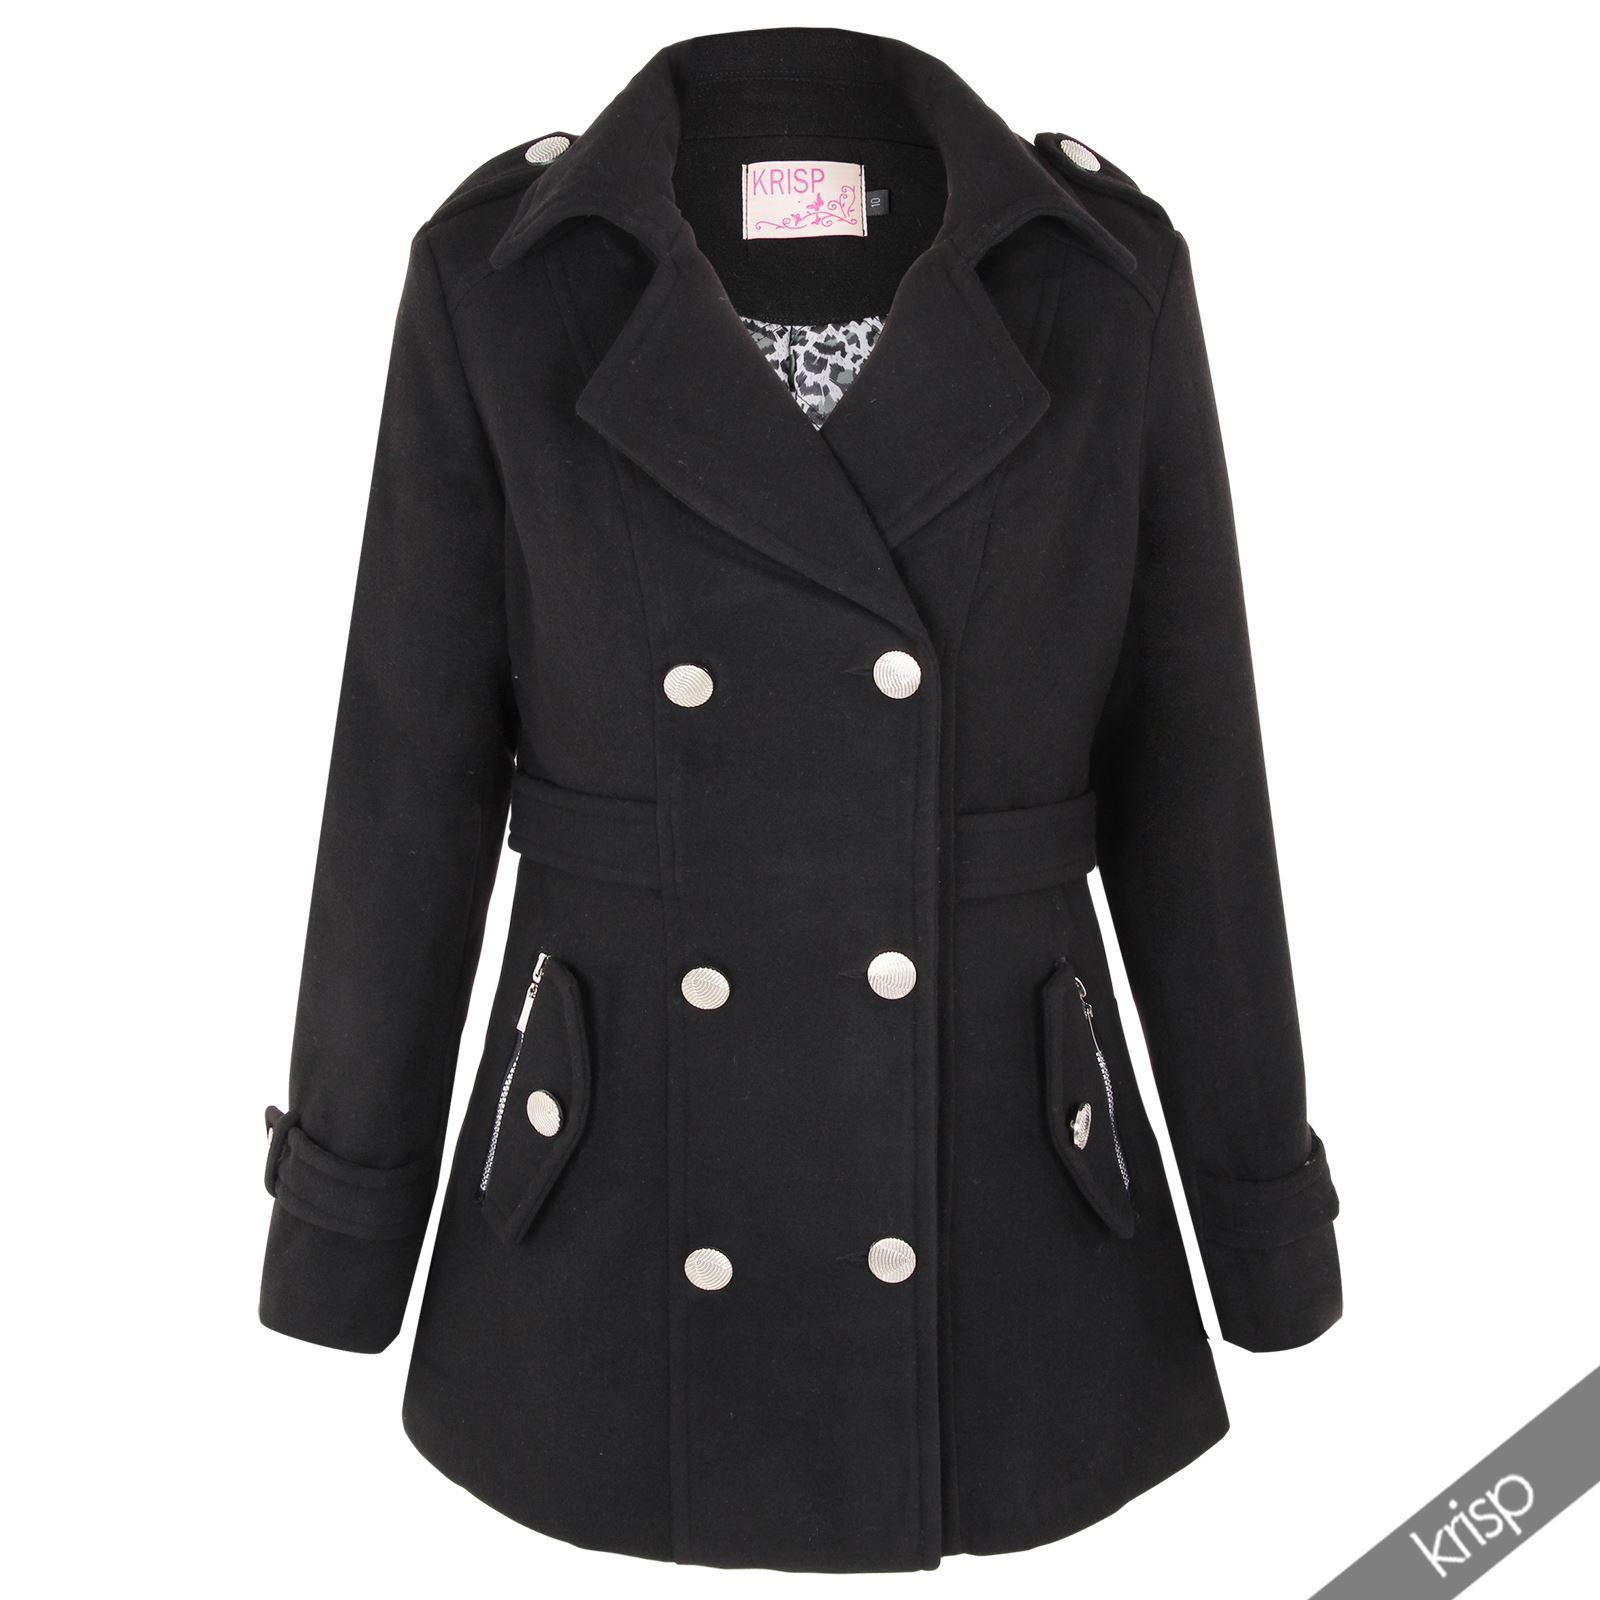 krisp damen mantel wollmantel zweireiher elegant jacke wolle umstandsmantel ebay. Black Bedroom Furniture Sets. Home Design Ideas